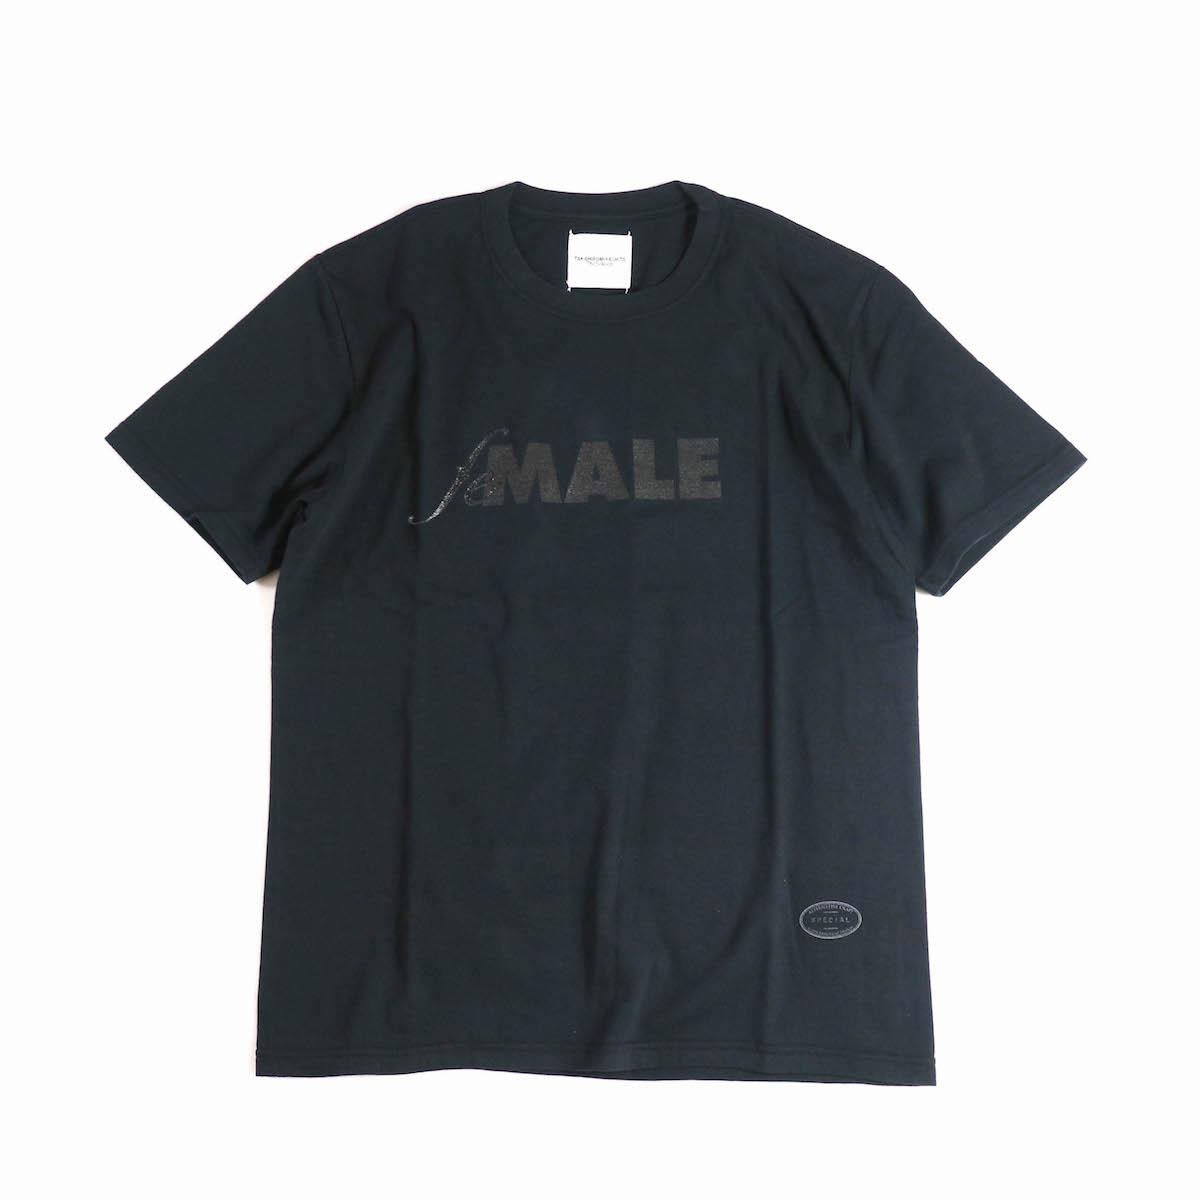 TAKAHIROMIYASHITATheSoloist. × TANGTANG / sc.0062SS18 feMALE s/s tshirts.